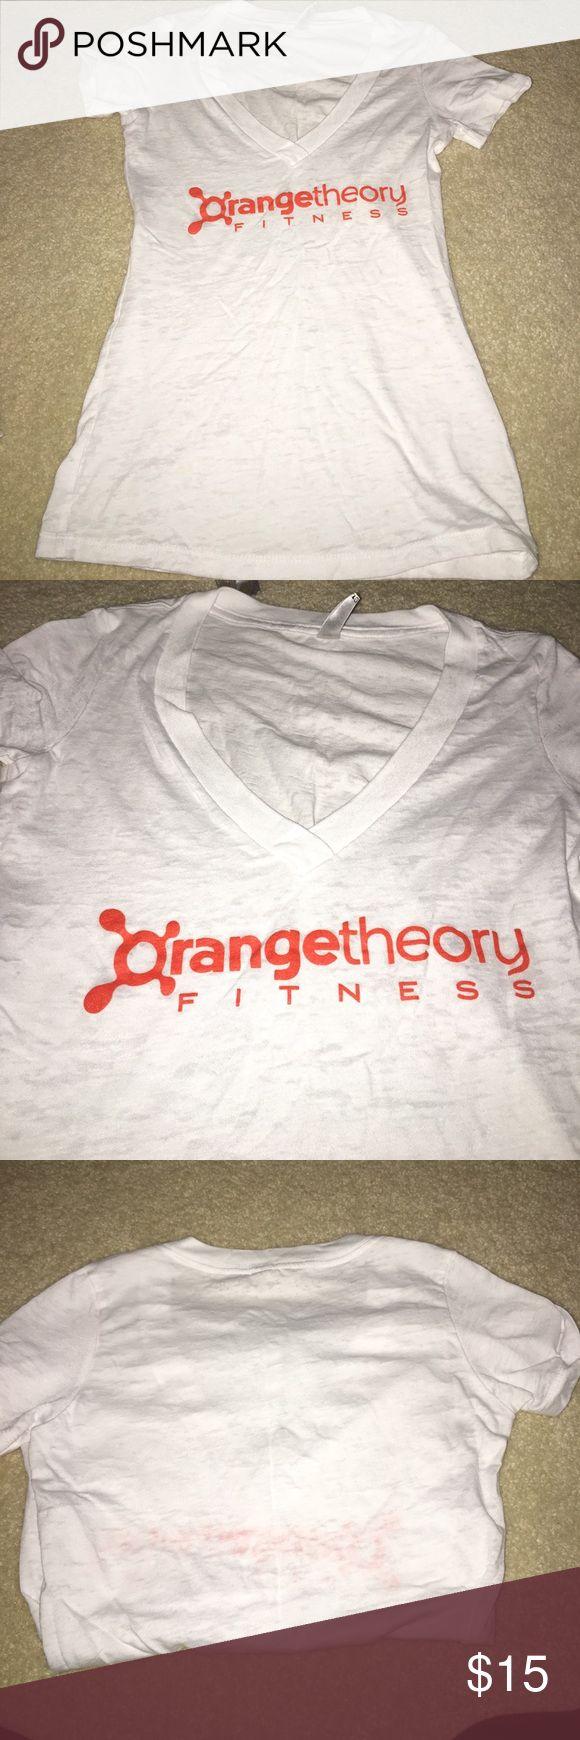 Orange Theory Fitness Top Sheer white v neck. Perfect condition!!! Orange Theory Fitness Tops